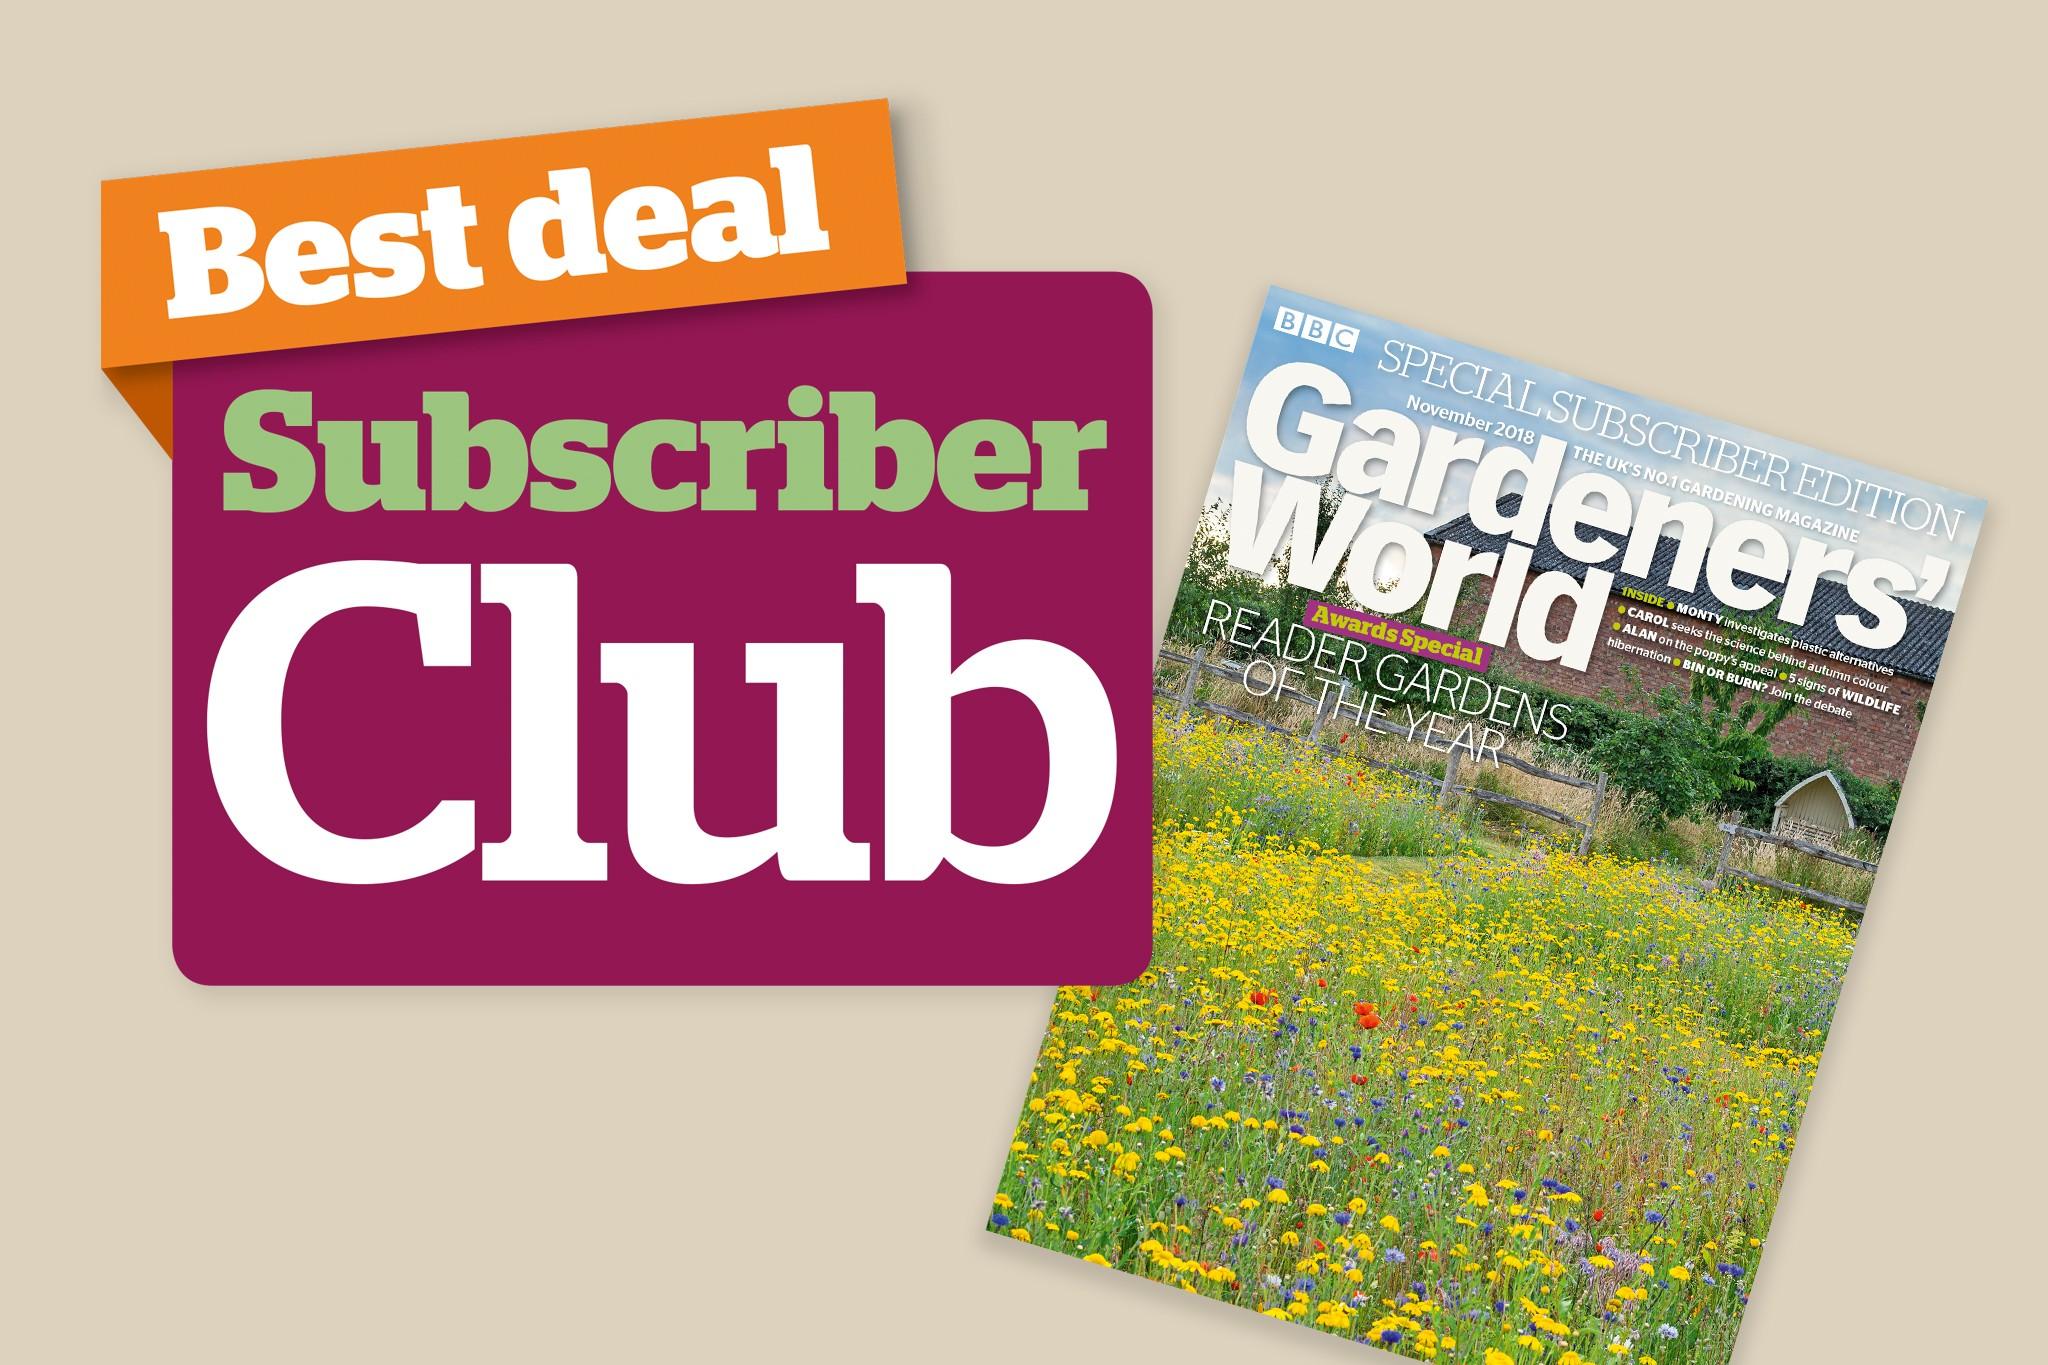 2048x1365-offers-subs-club-discount-nov